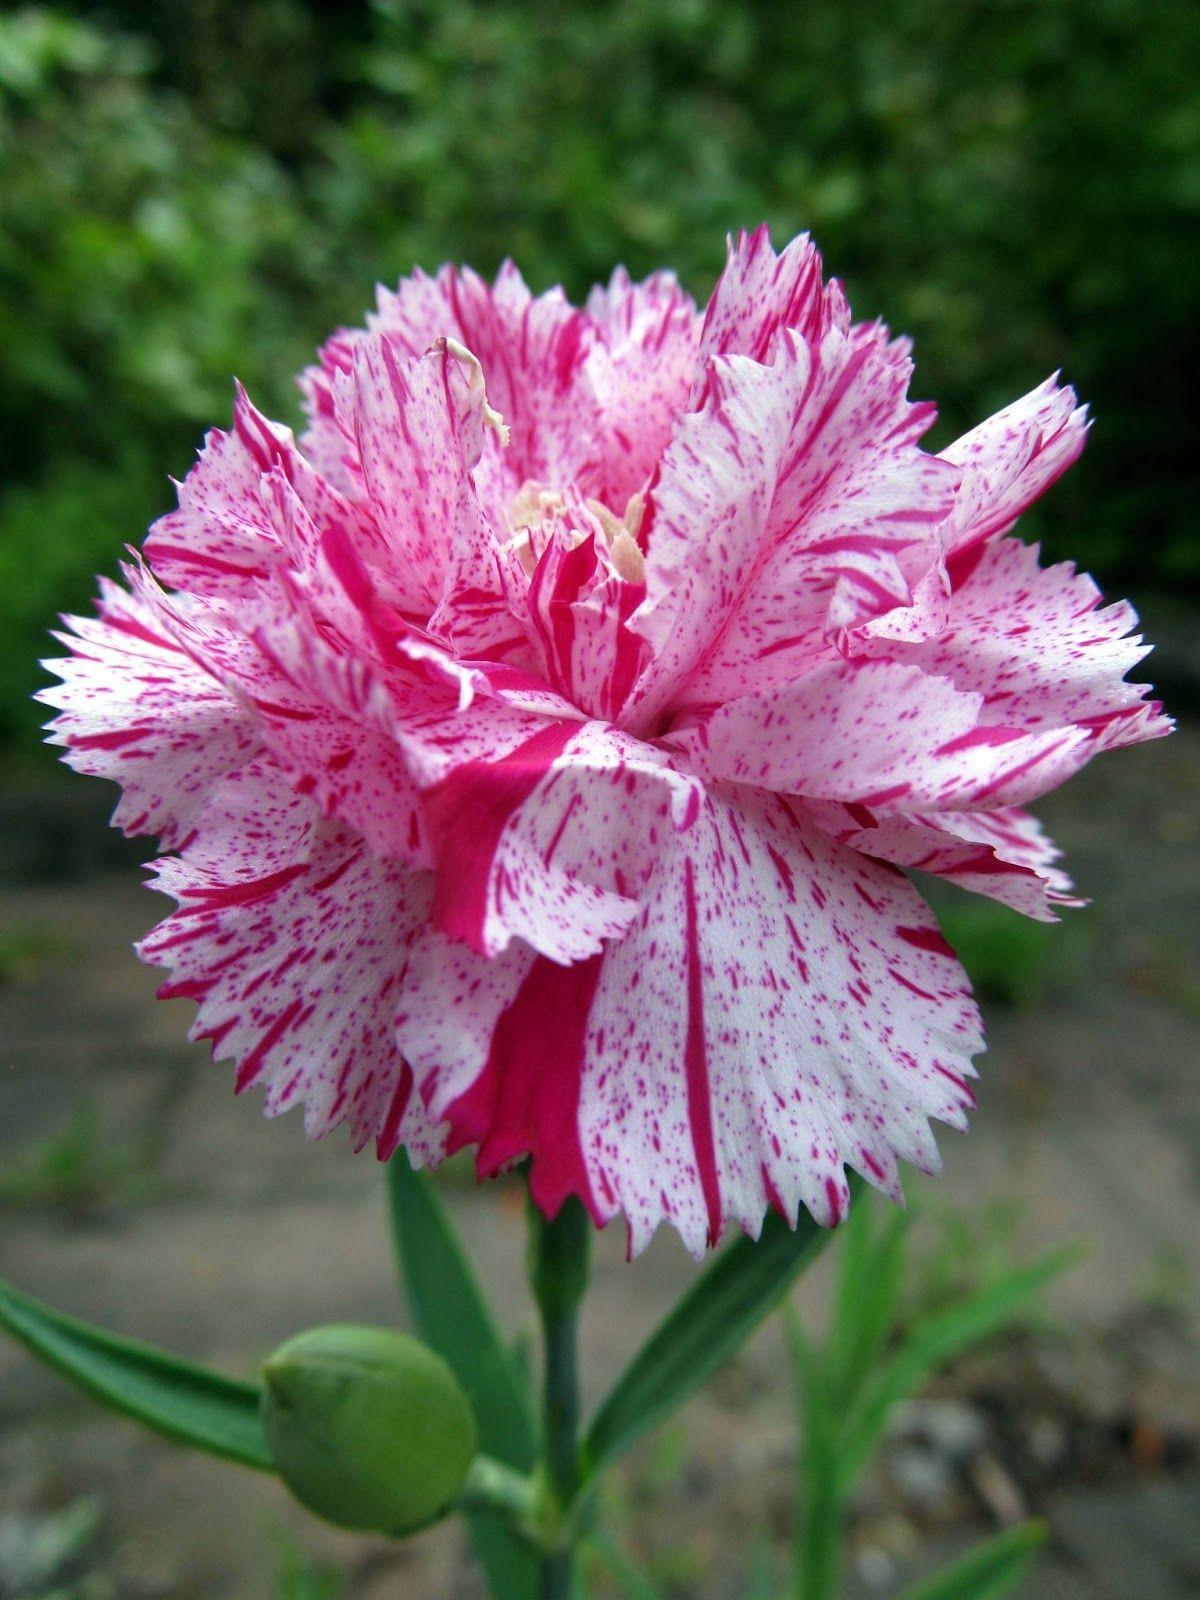 Red And White Striped Carnations Means A Refusal Fiori Rosa Fiori Rari Fiori